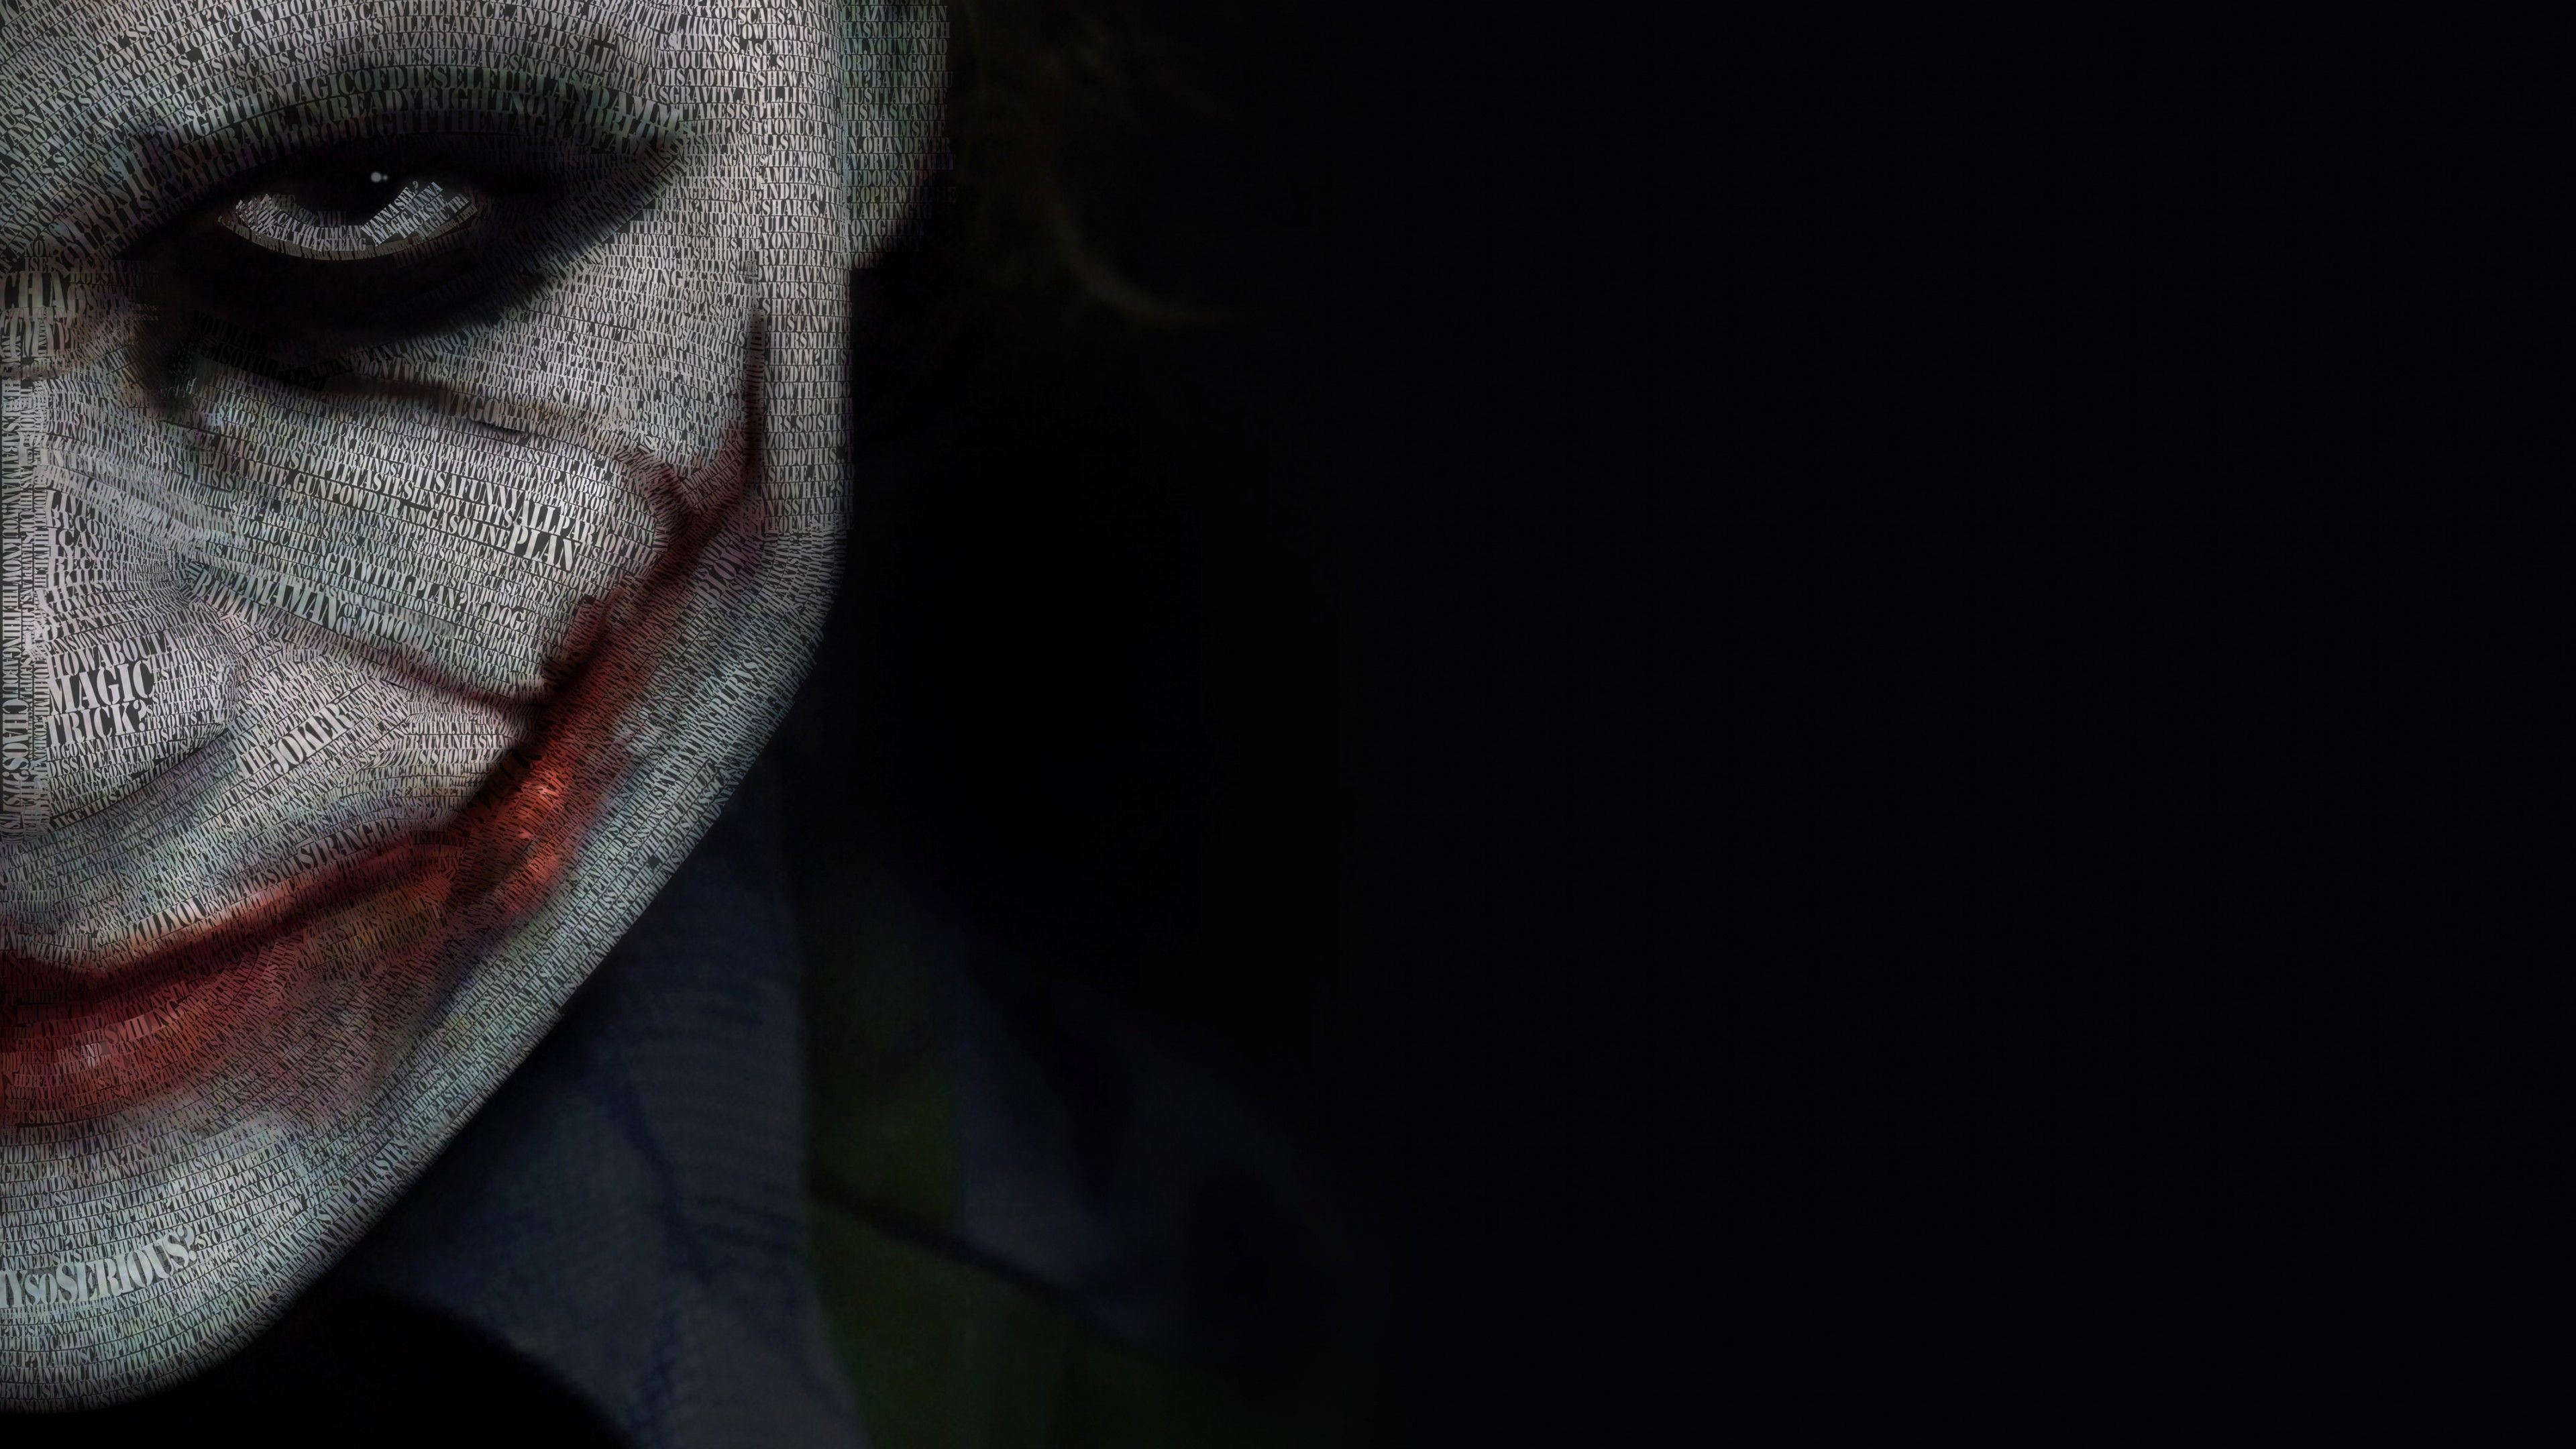 Joker 4k Ultra Hd Wallpaper Download Joker Pics 4k Wallpaper For Mobile Joker Hd Wallpaper